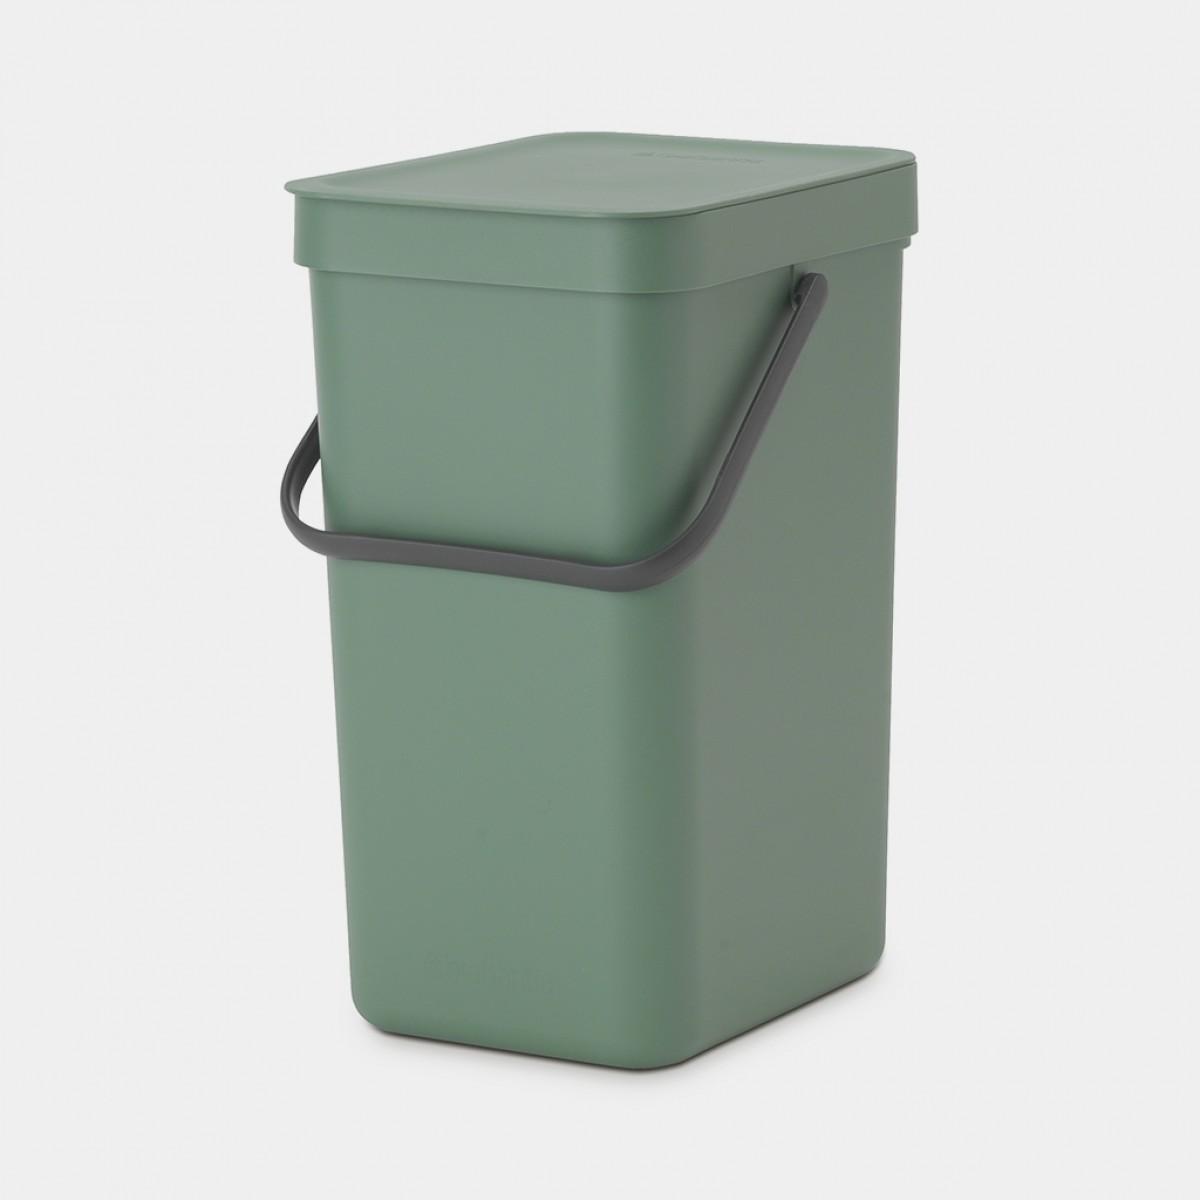 BRABANTIA Affaldsspand m/ låg - Affaldssortering 12 ltr - grøn